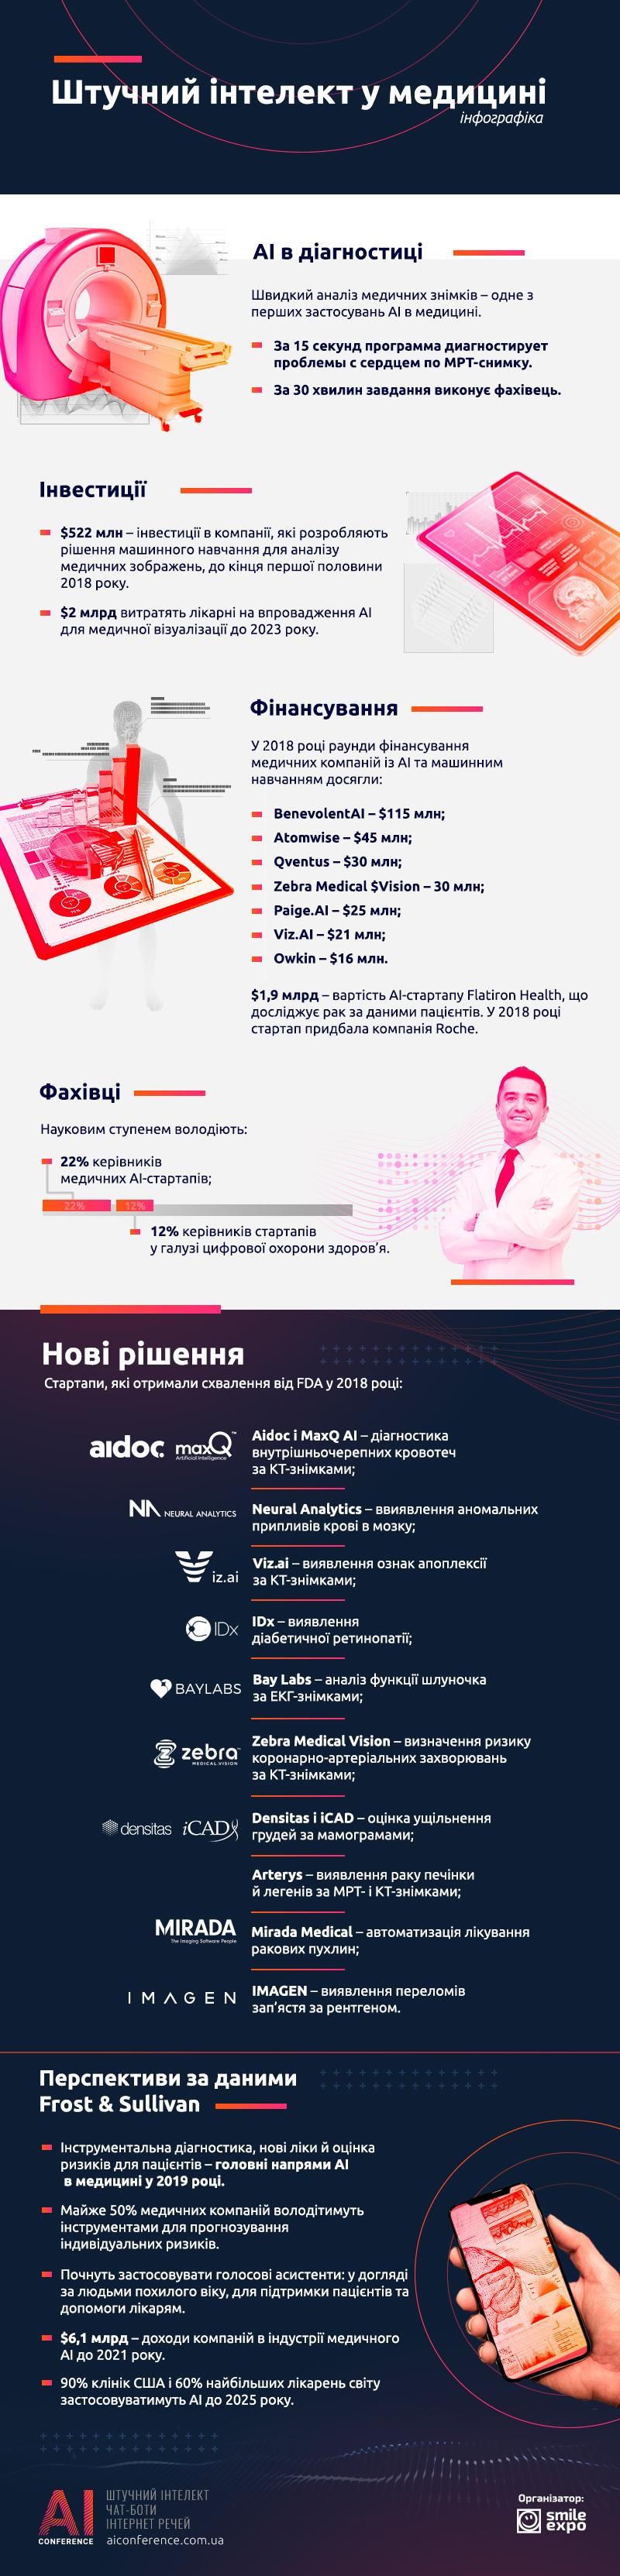 AI Conference Kyiv: Shtuchniy Intelekt u meditsinI: InfografIka 1